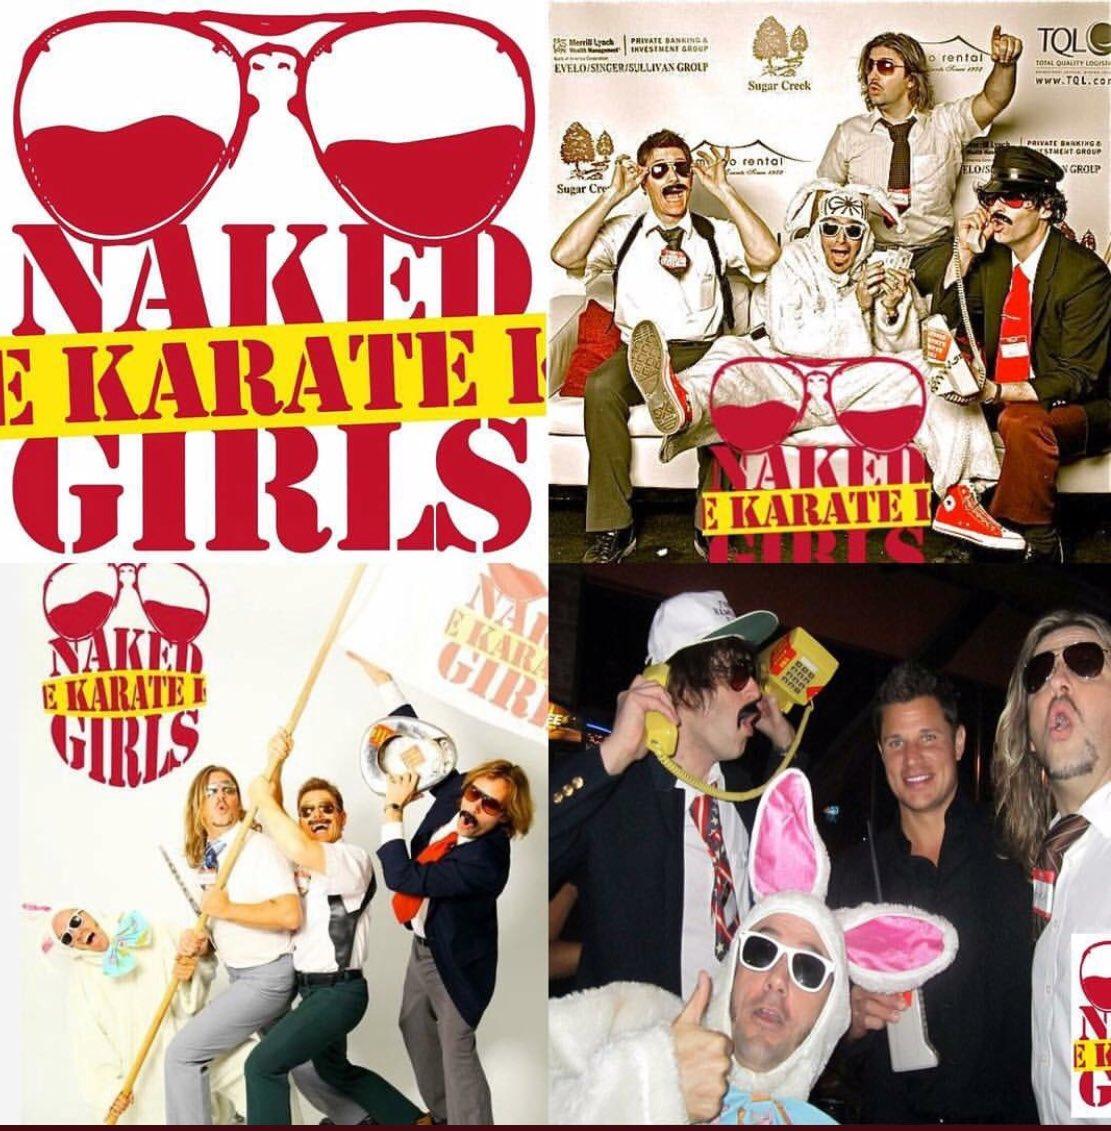 Naked Karate Girls - Home   Facebook